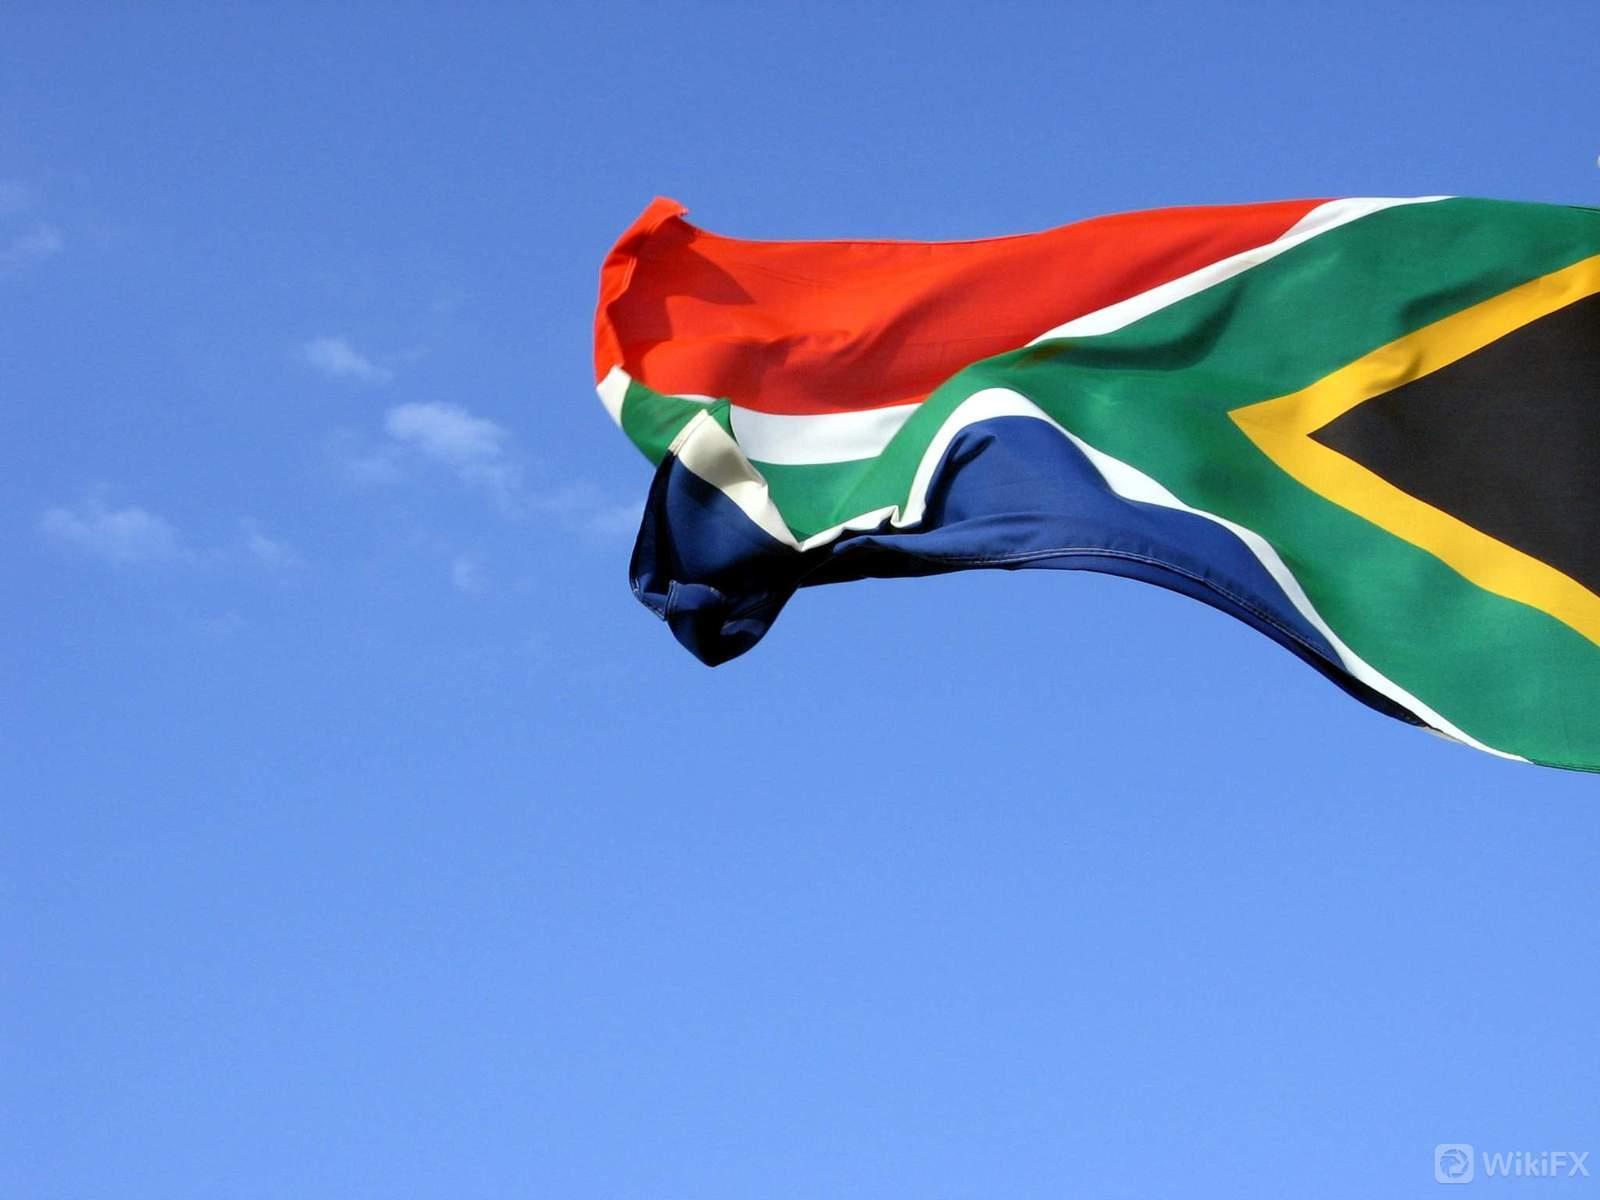 south-african-flag-1-1624806.jpg